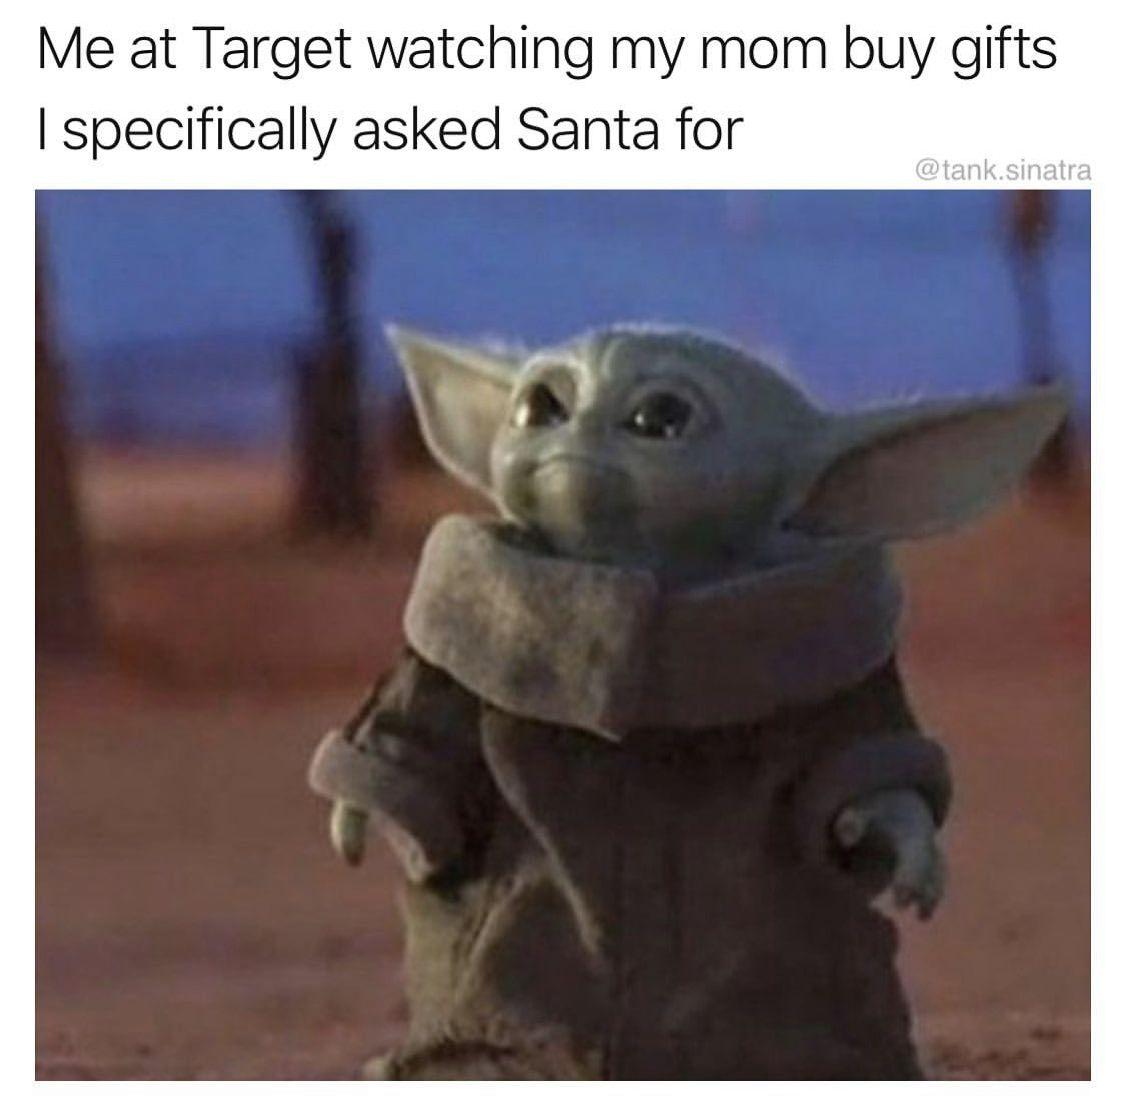 Gifts Comedy Funny Yoda Meme Yoda Funny Star Wars Memes